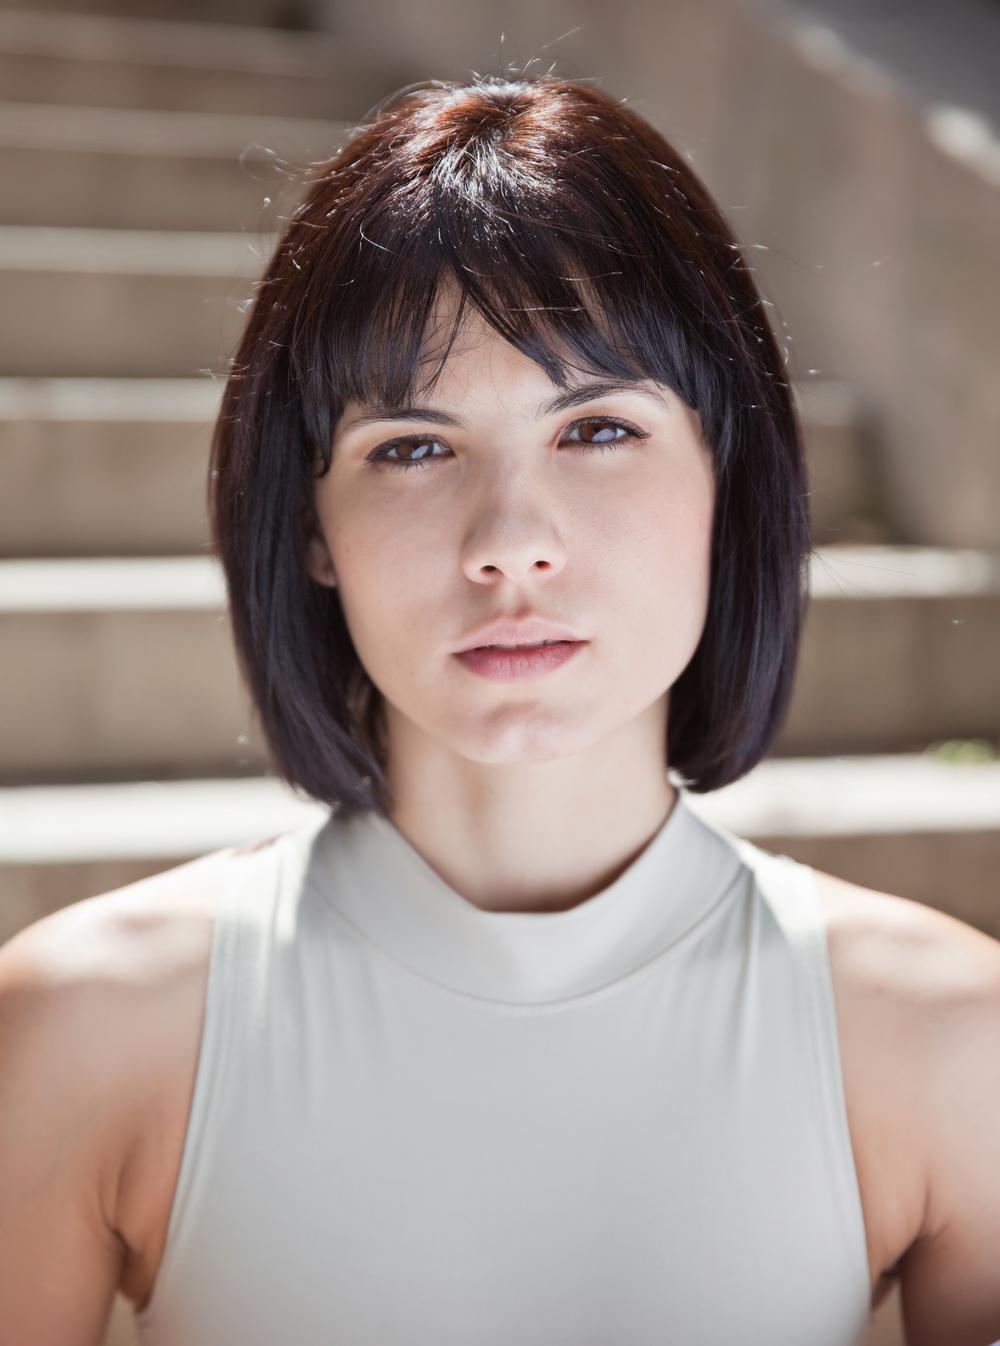 Luciana Voltolini